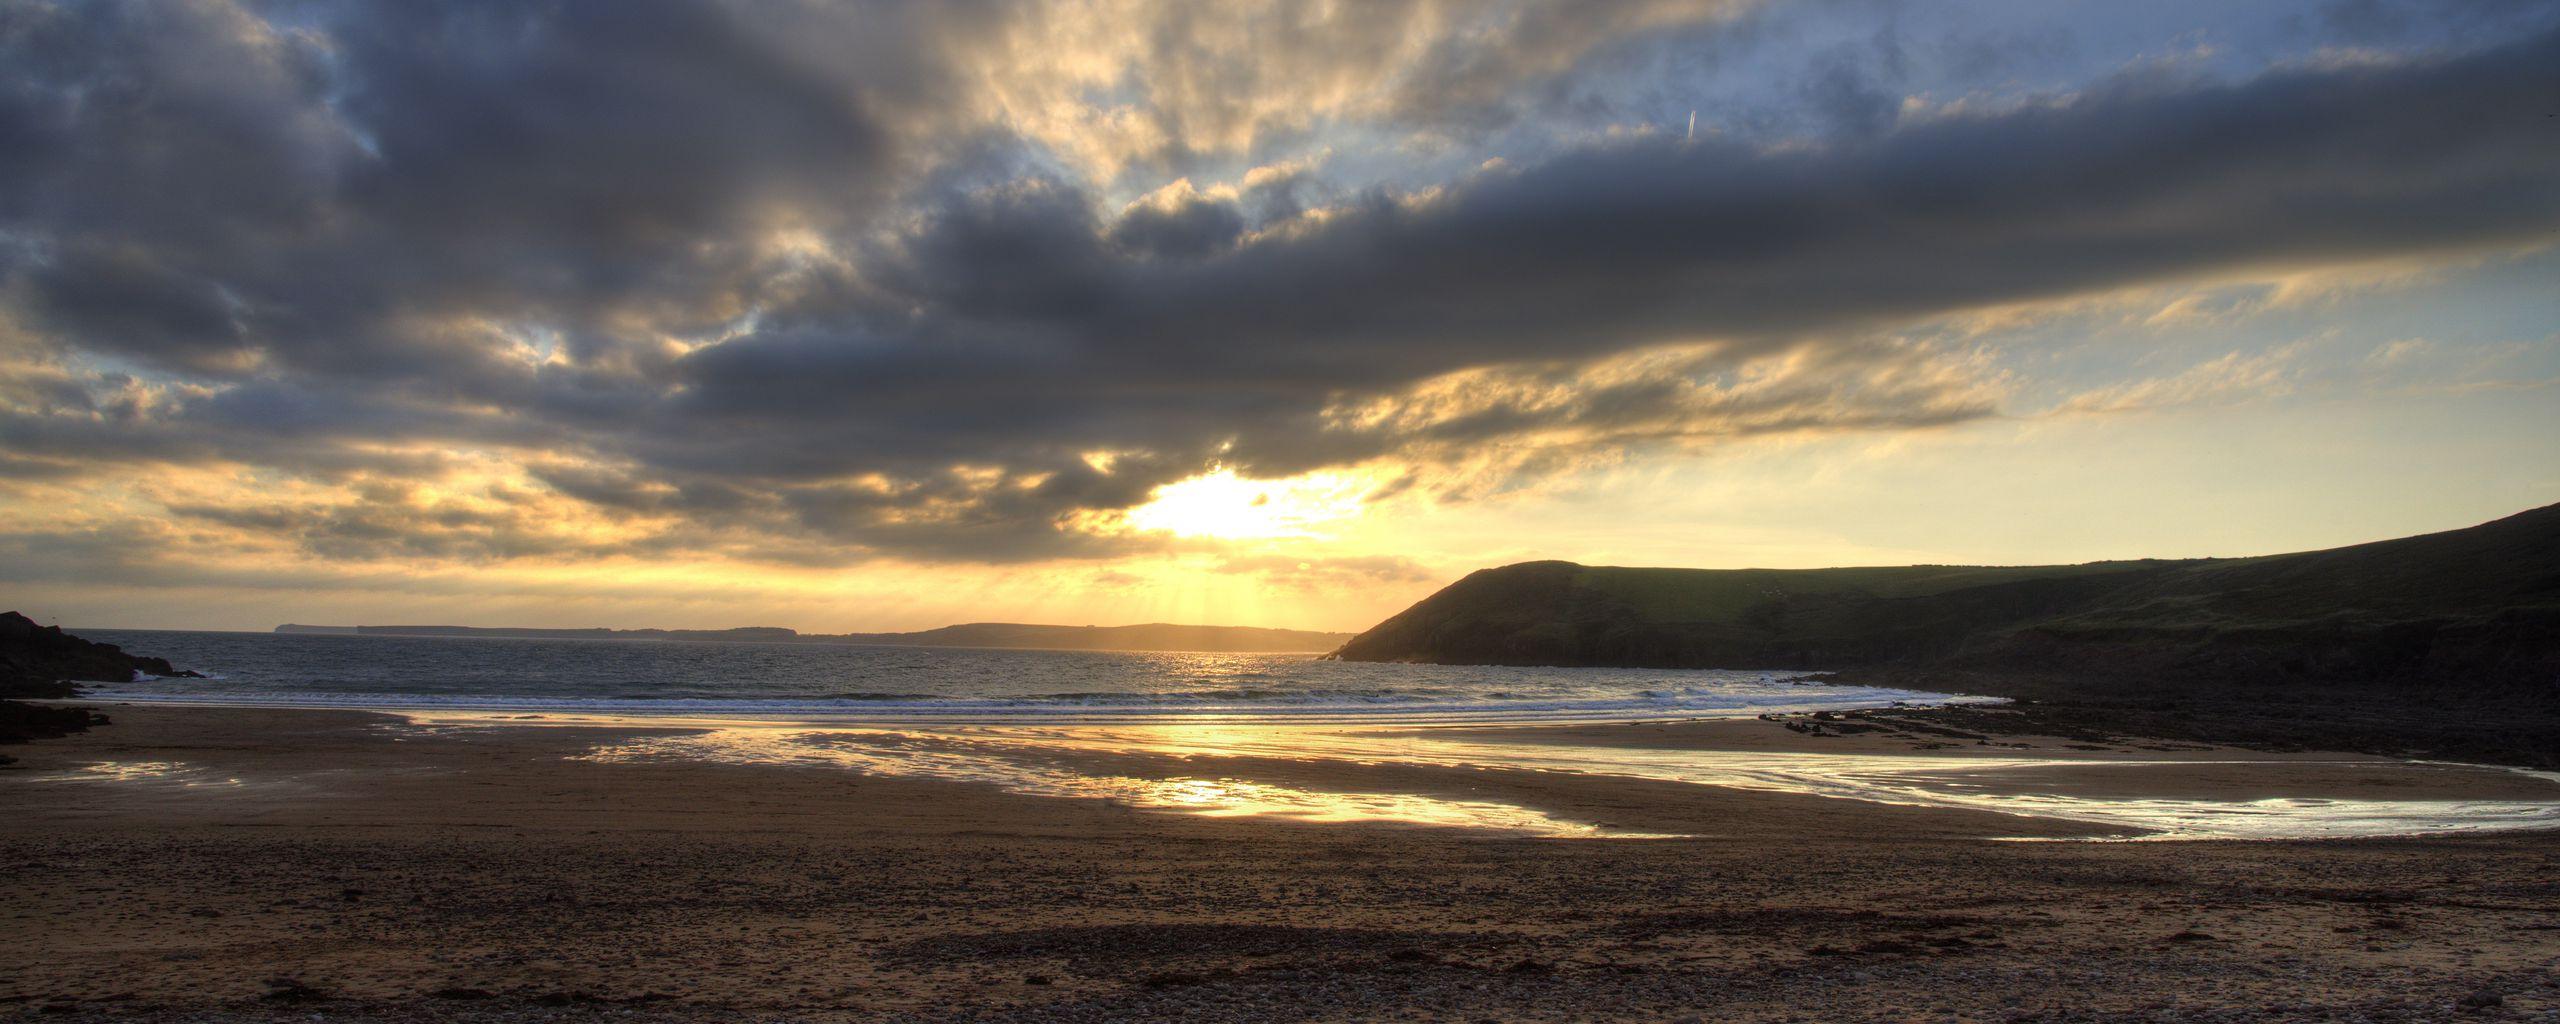 2560x1024 Wallpaper shore, water, sunset, landscape